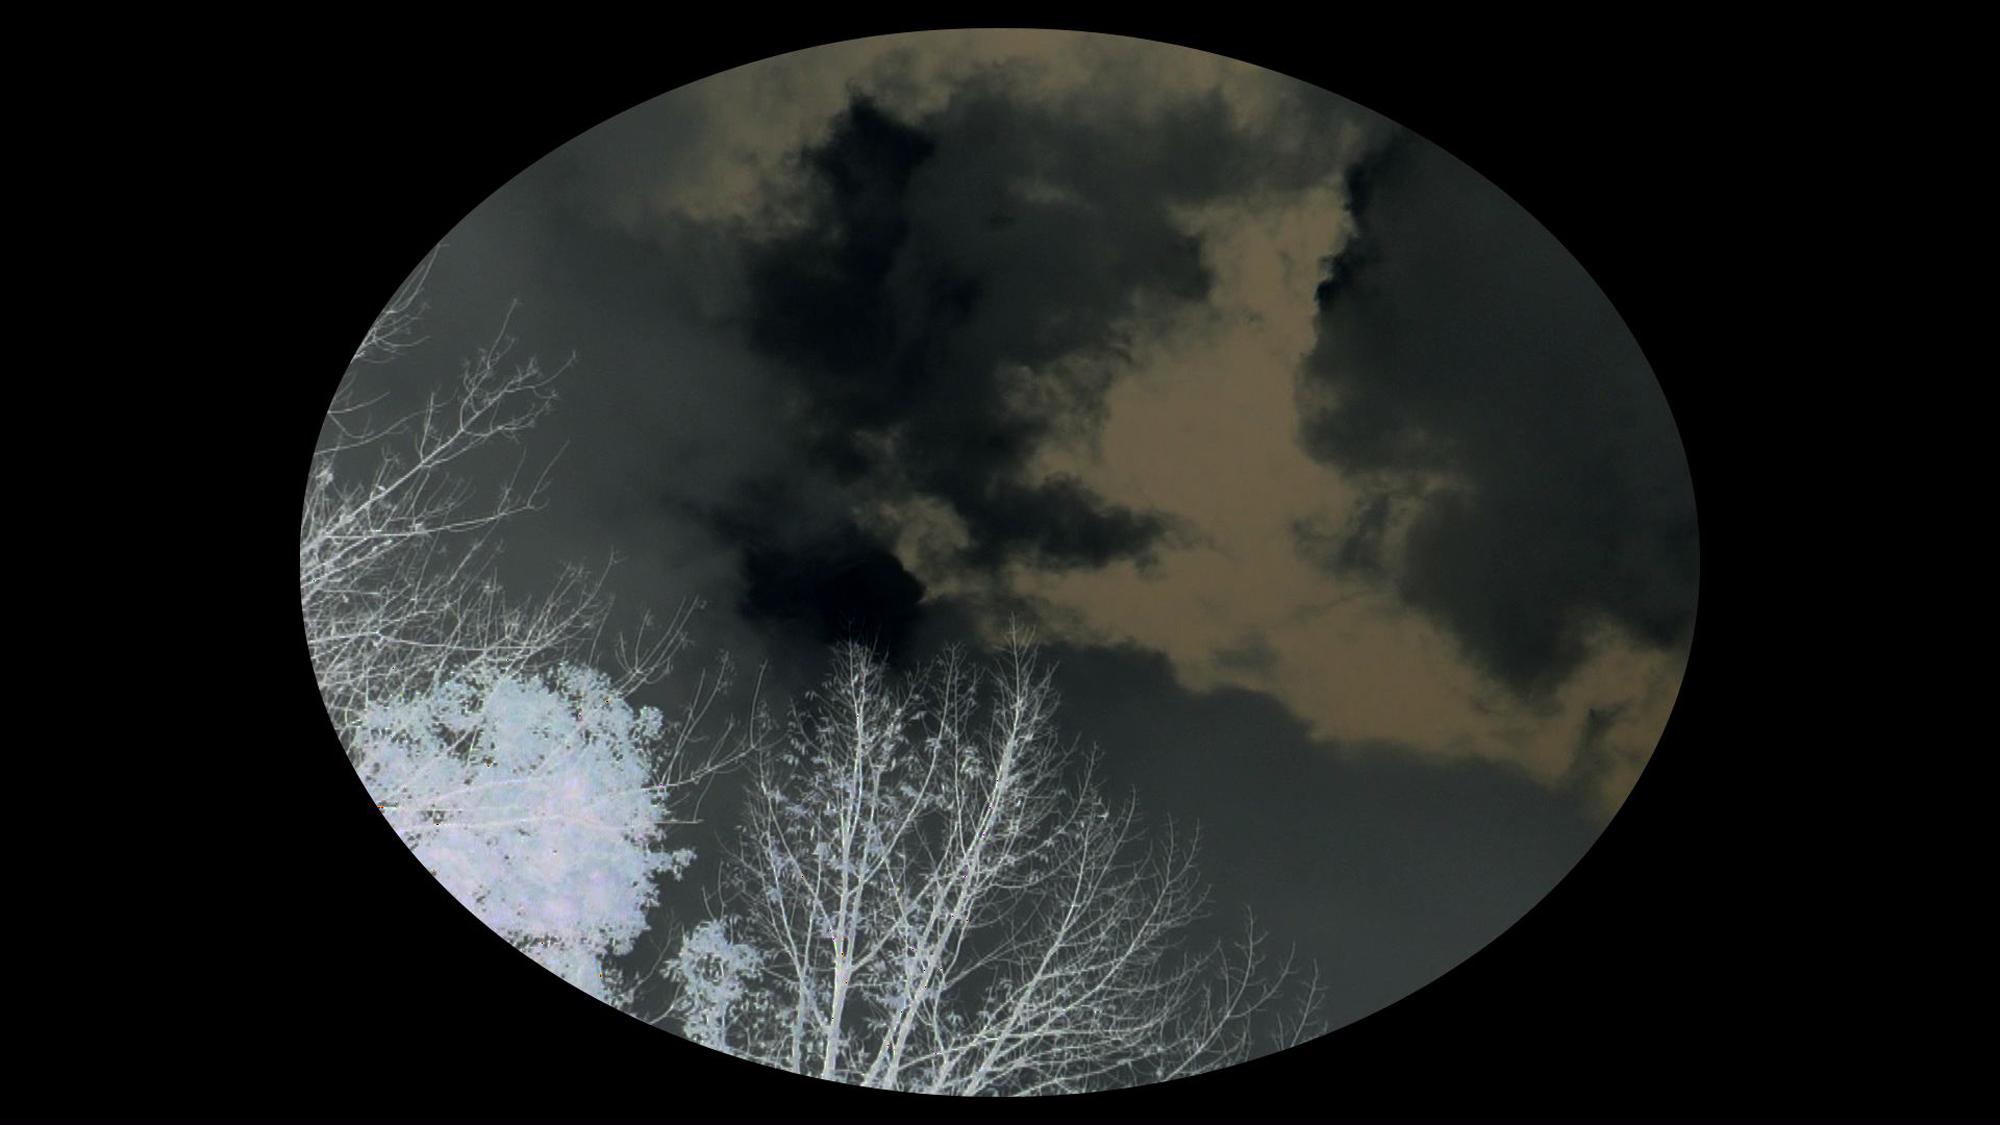 6j_Ashokan-solarized-2-Mask-for-Wall-CC-04172014-Izzy-Ashokan.00_06_58_07.Still008.jpg